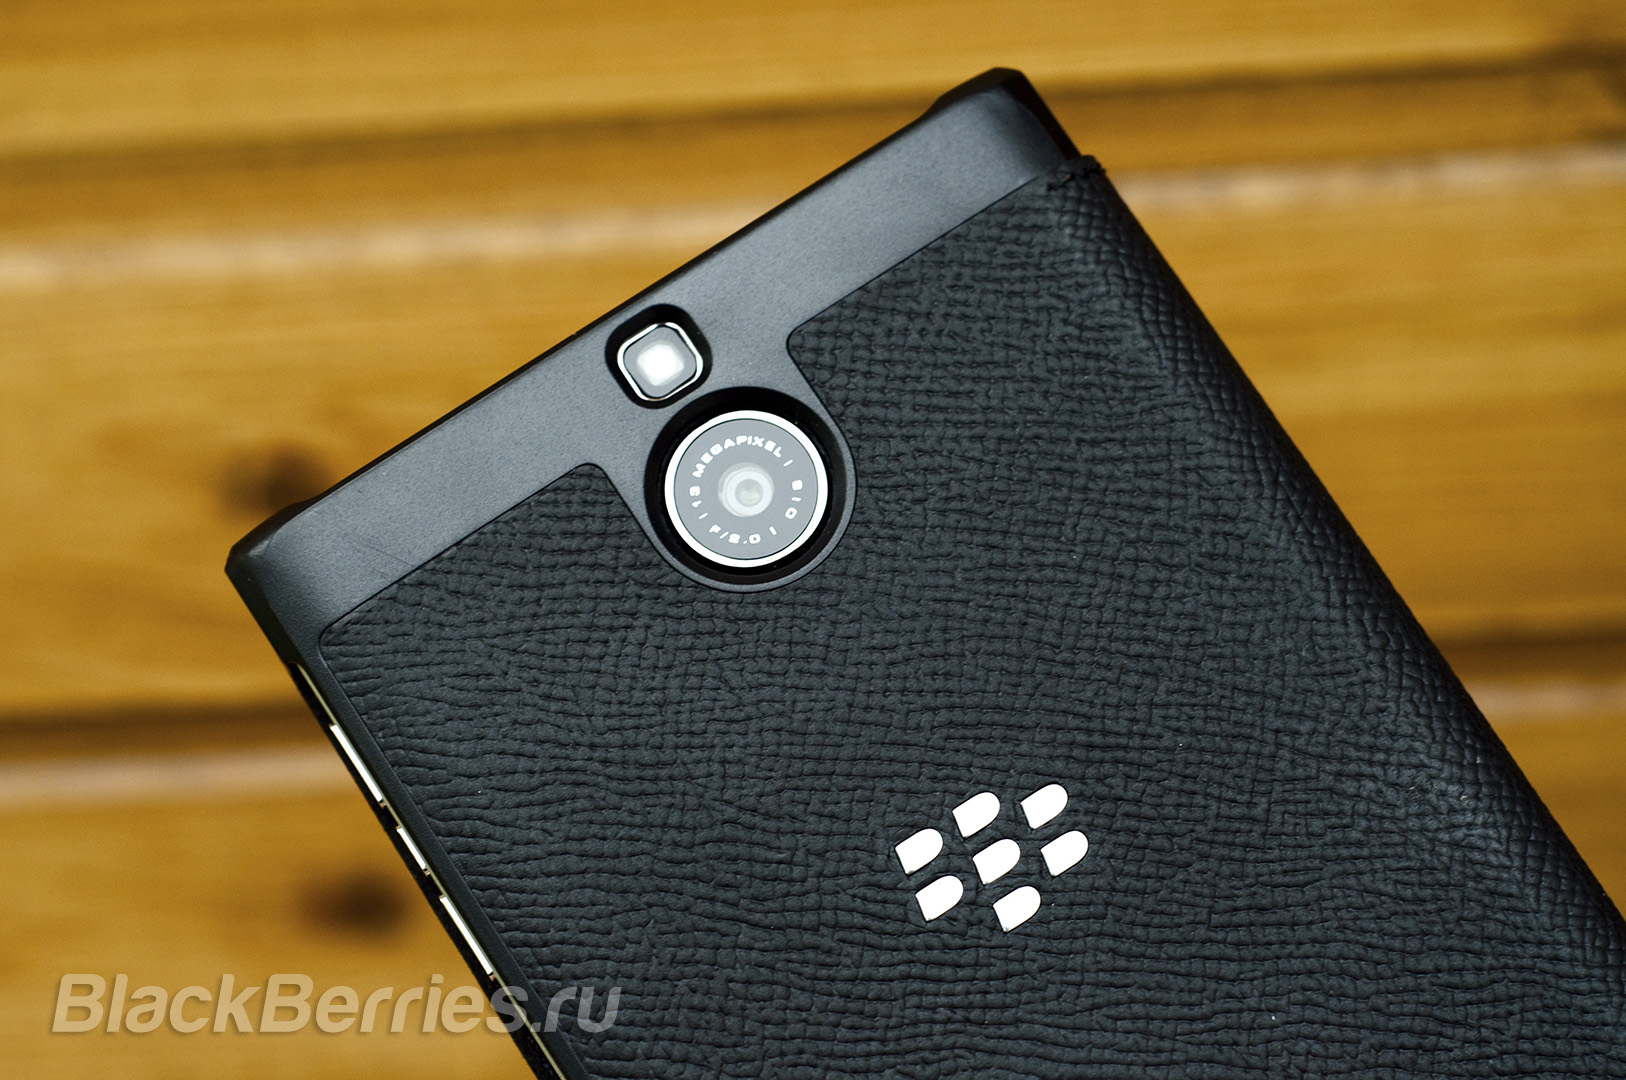 BlackBerry-Passport-Silver-Edition-Cases-10